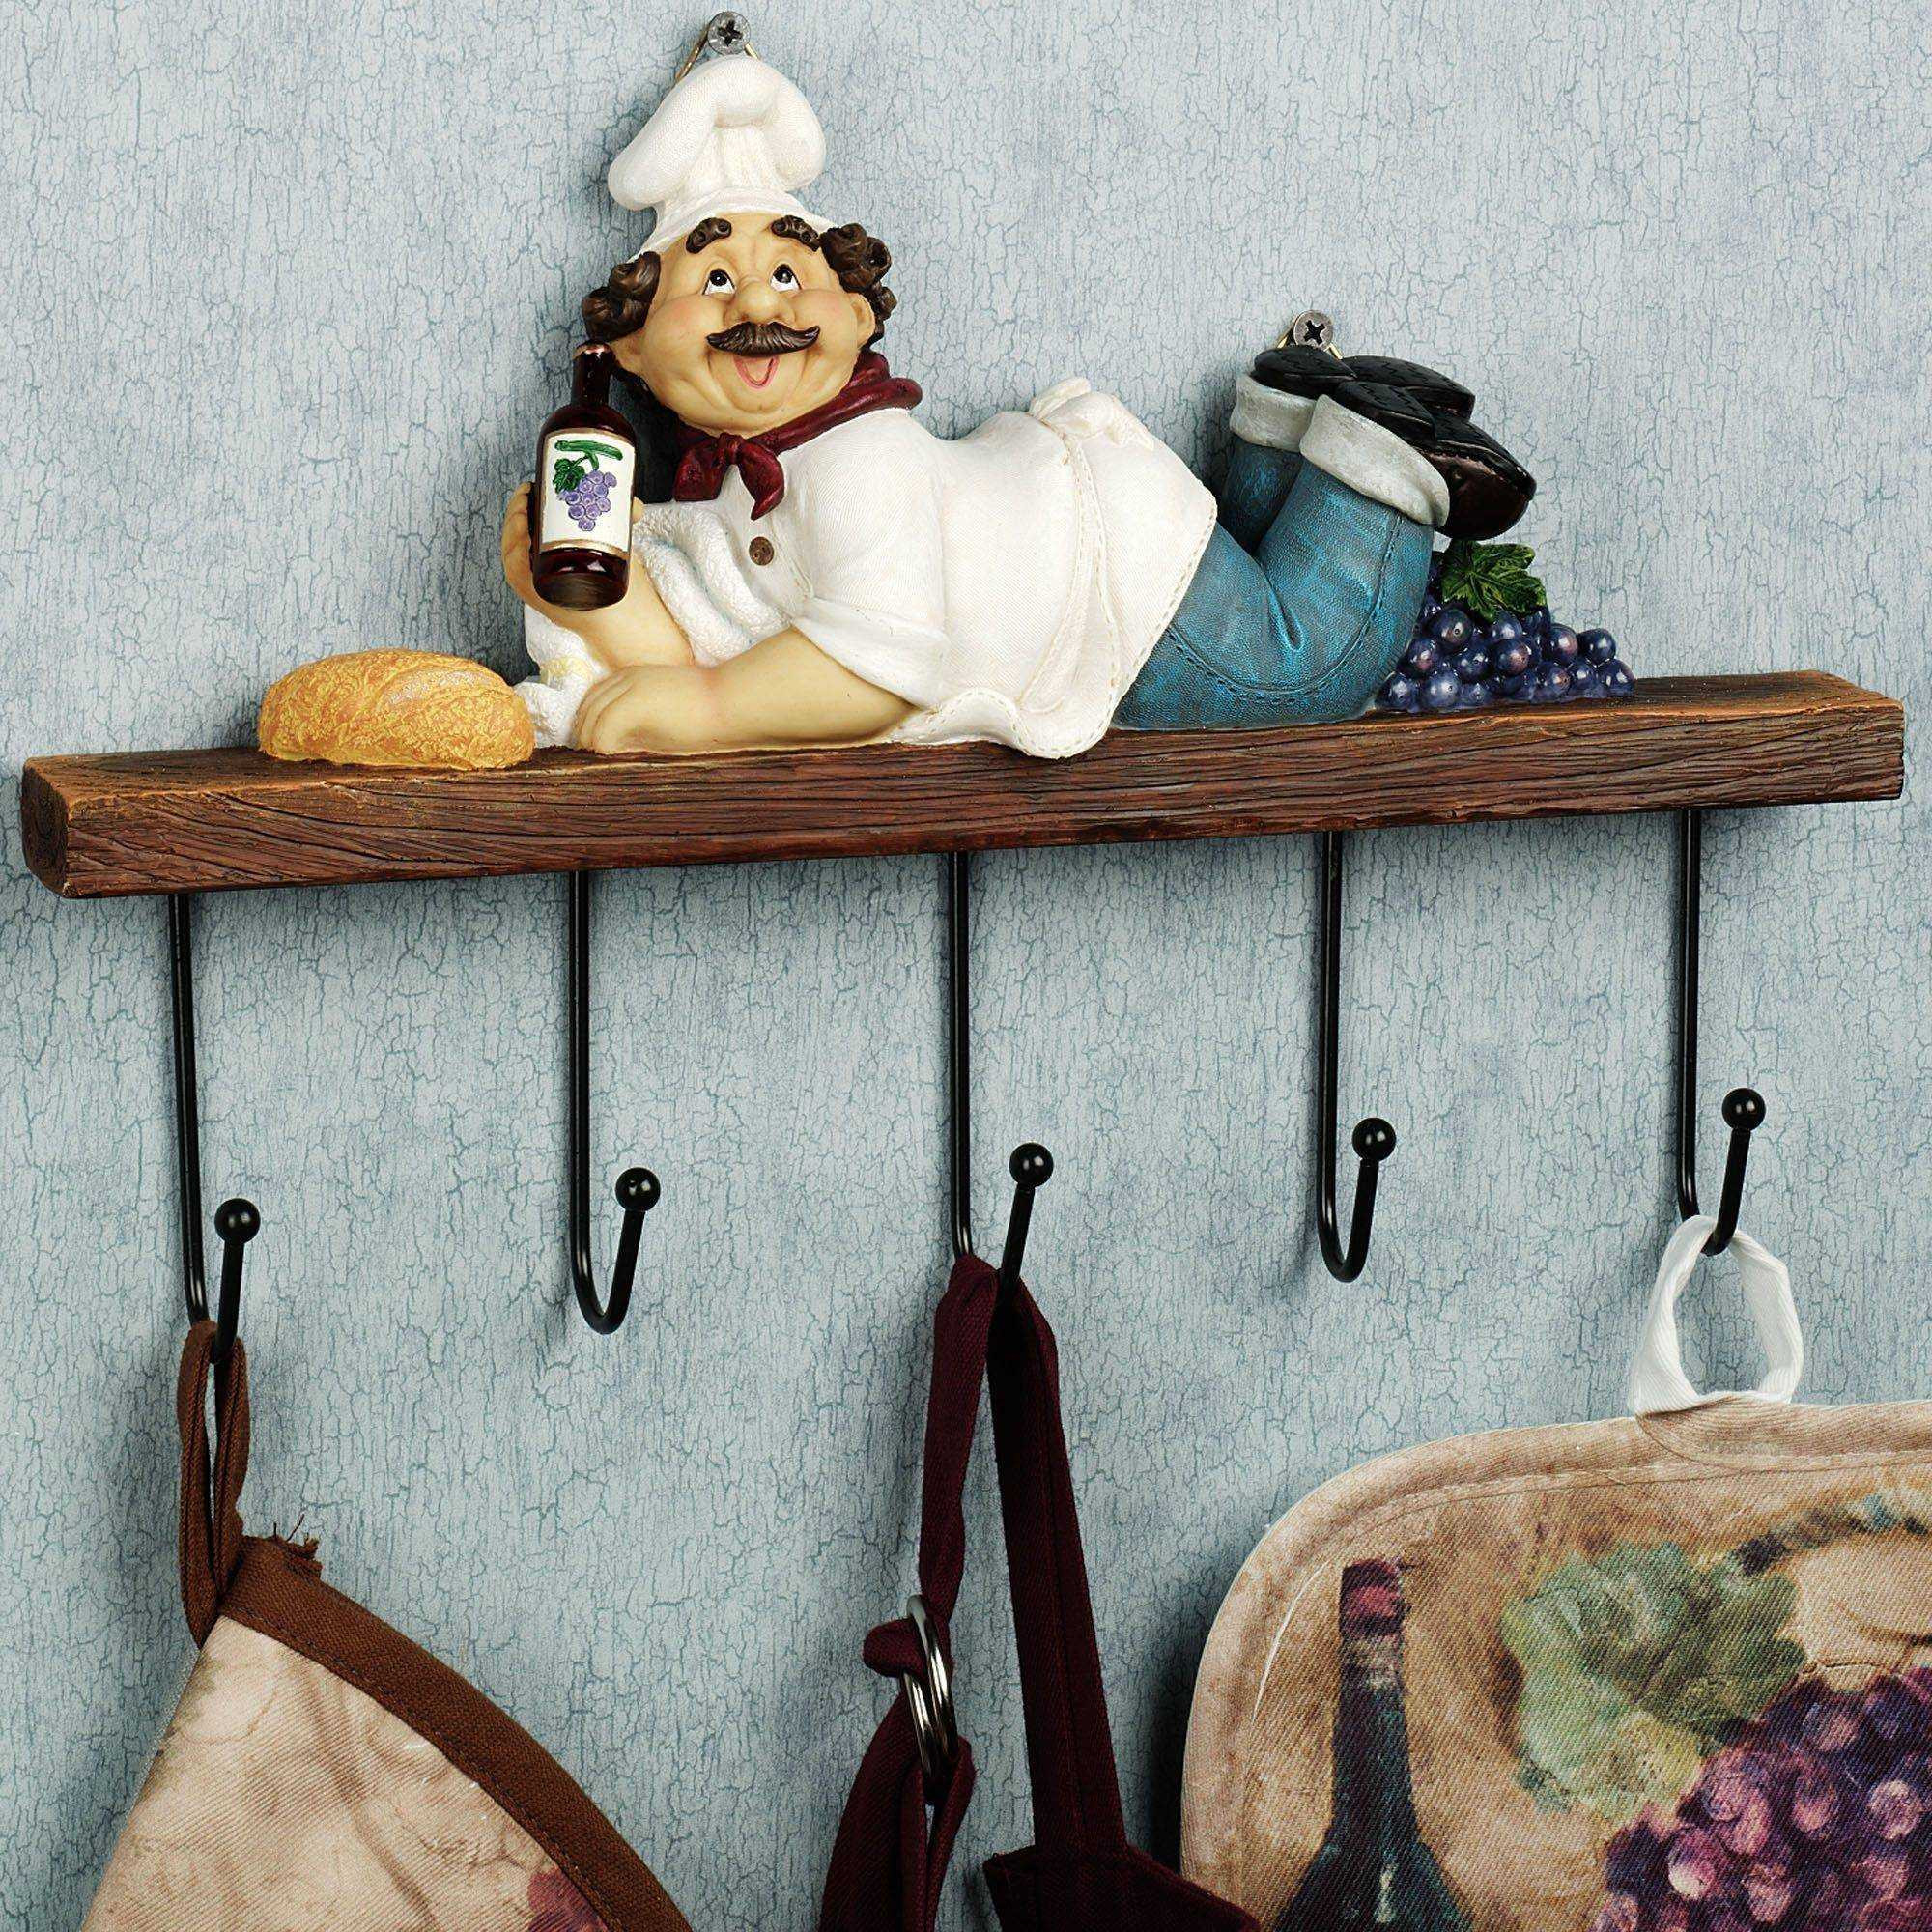 Best ideas about Chef Kitchen Decor Accessories . Save or Pin Unique Chef Kitchen Decor Architecture Now.